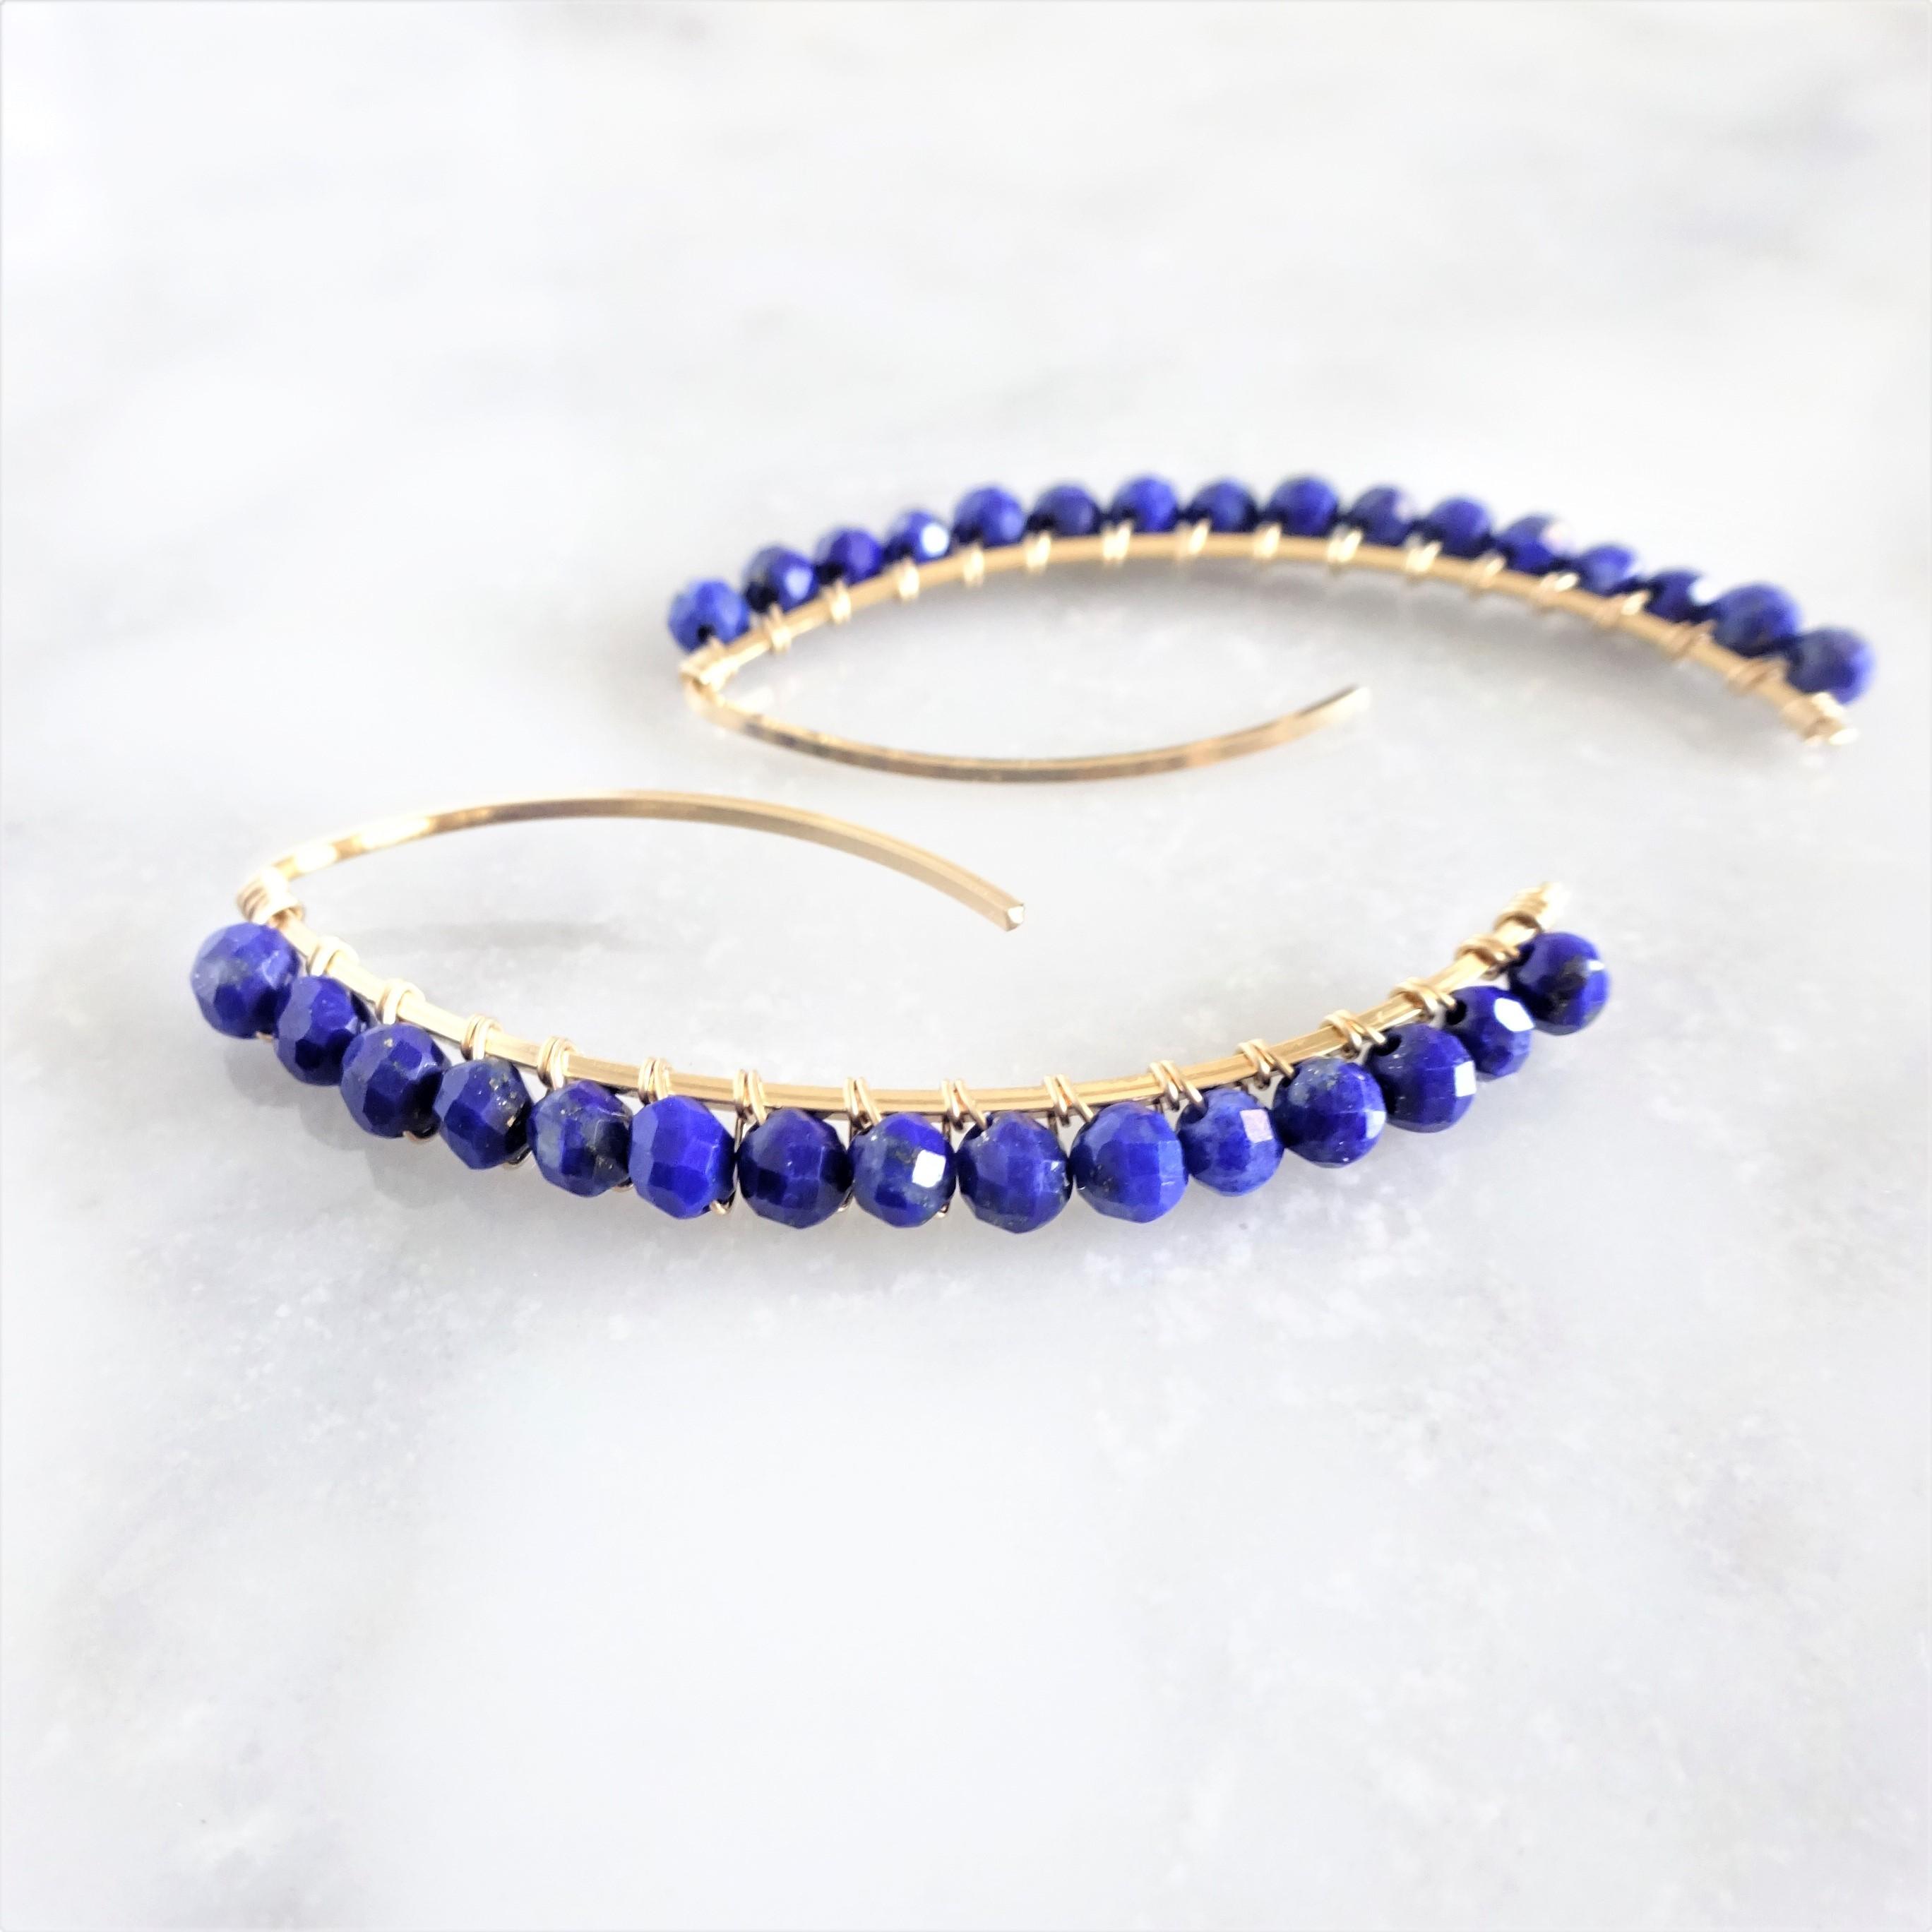 送料無料 14kgf*宝石質Lapislazuri wrapped marquis pierced earring